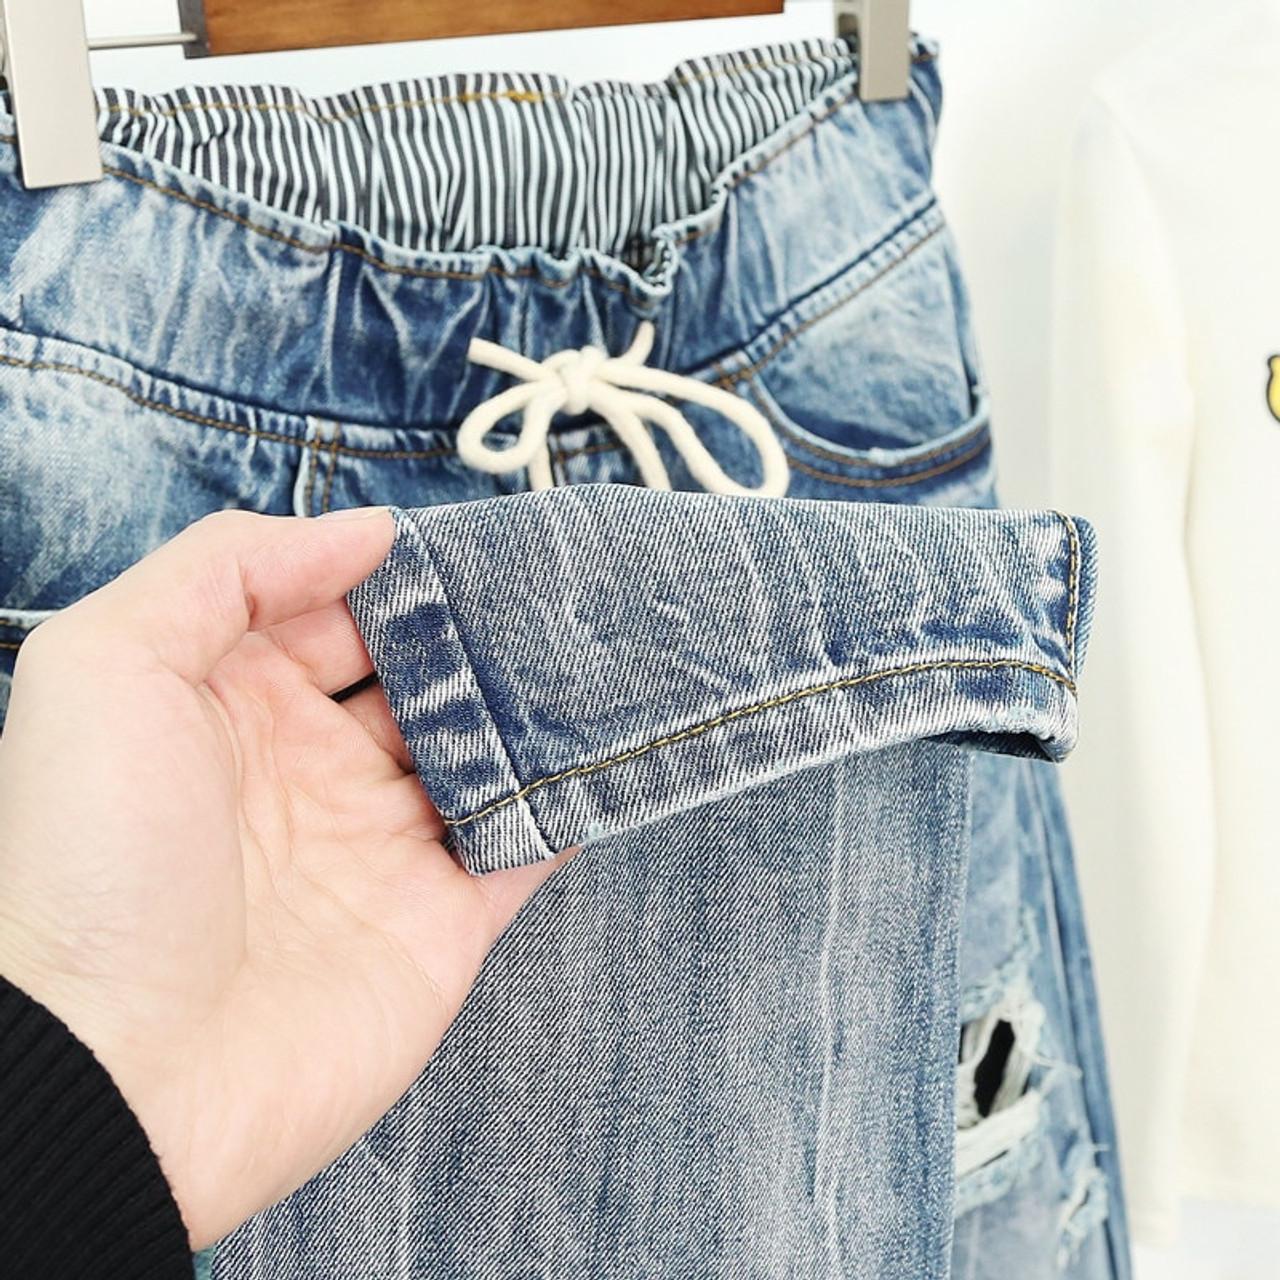 Summer Ripped Boyfriend Jeans For Women Fashion Loose Vintage High Waist Jeans Plus Size Jeans 5xl Pantalones Mujer Vaqueros Q58 Onshopdeals Com